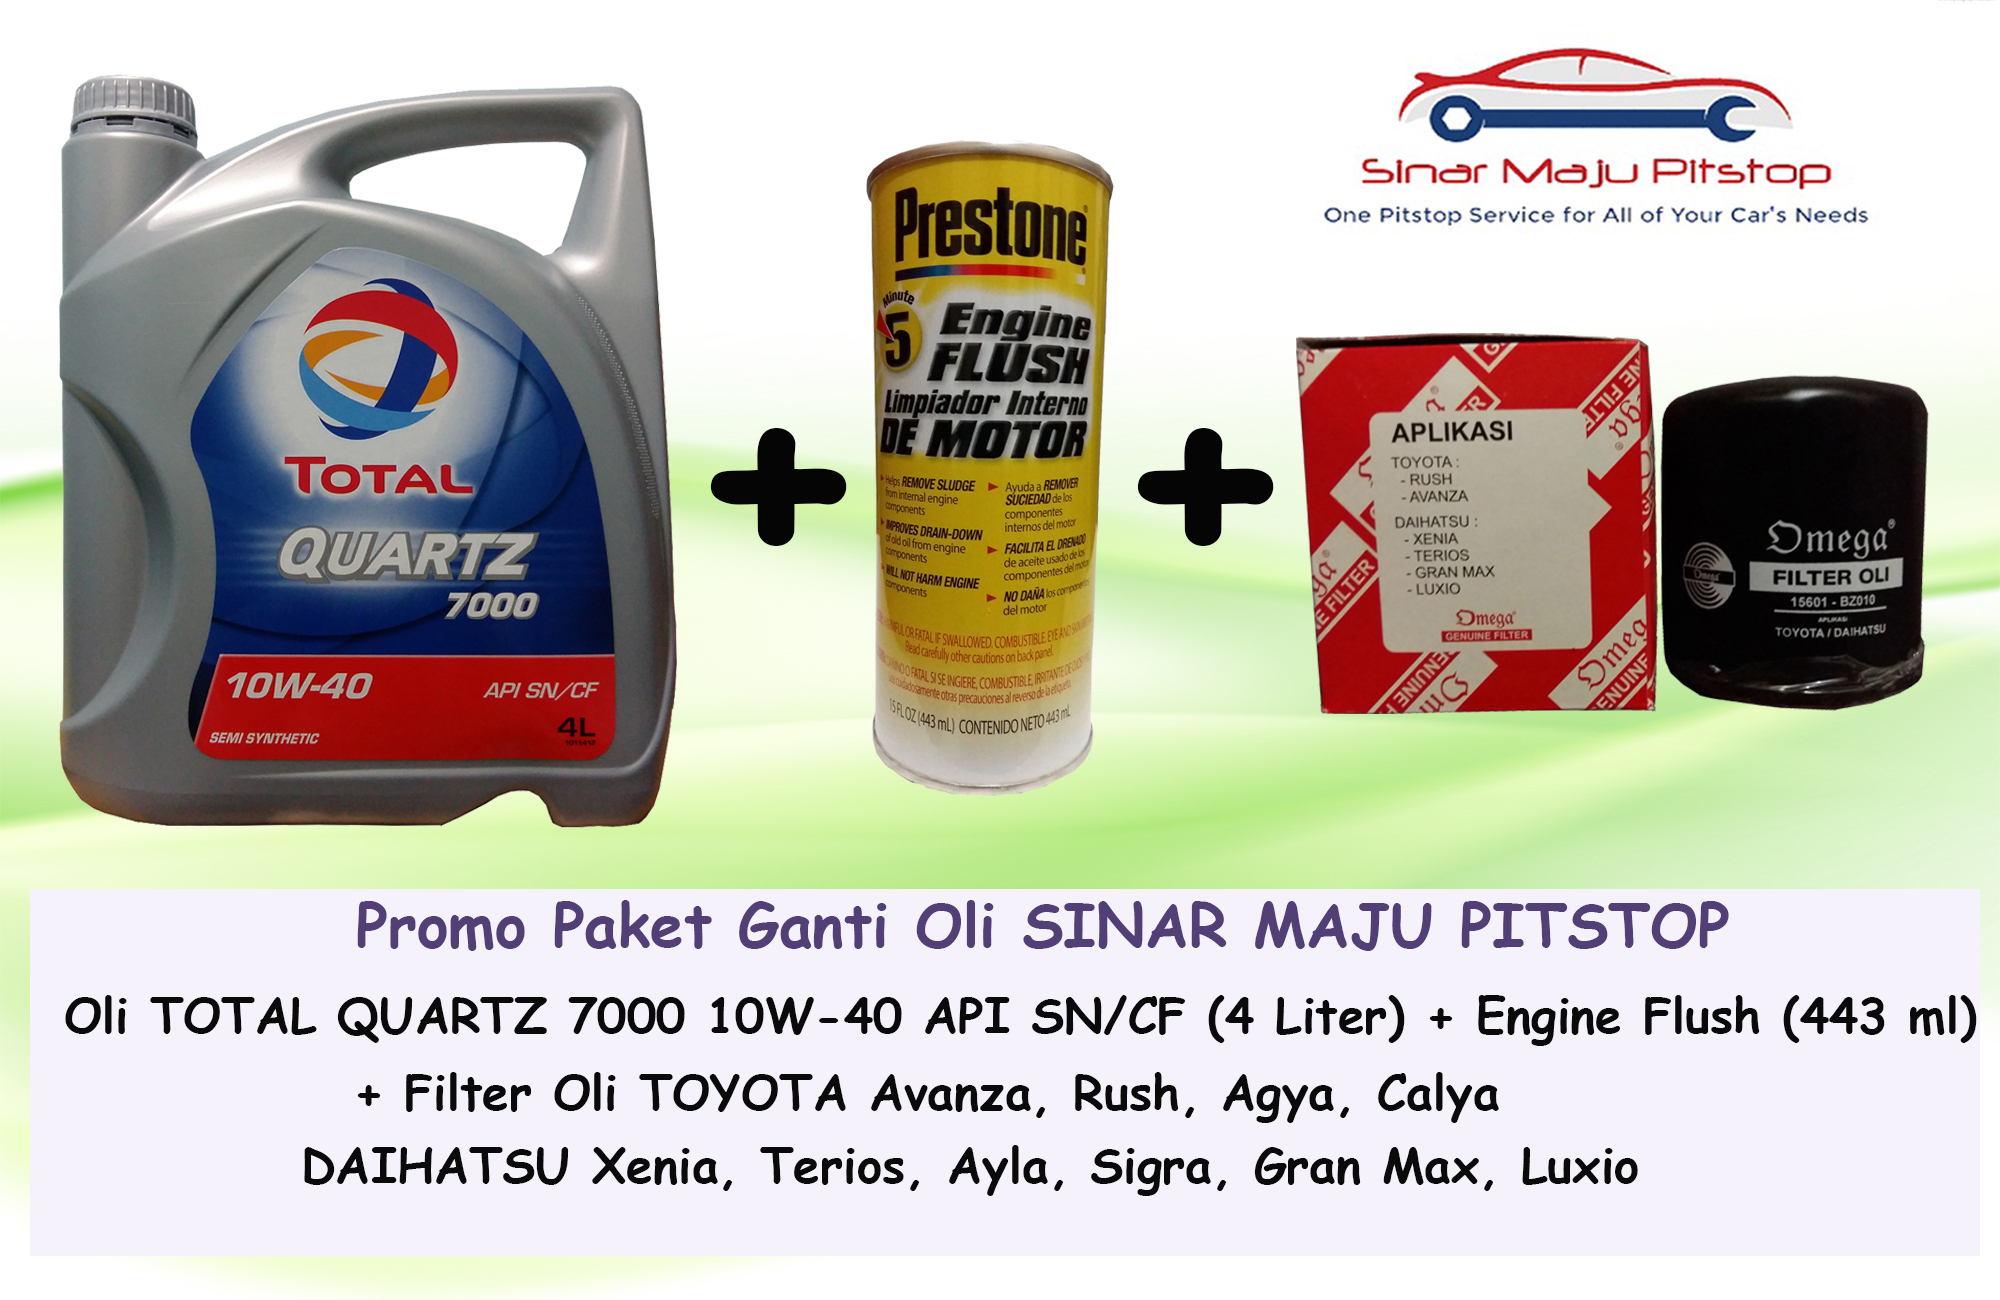 Jual Paket Ganti Oli Mobil Calya Sigra Total Quartz Filter Omega Prestone Engine Flush Original